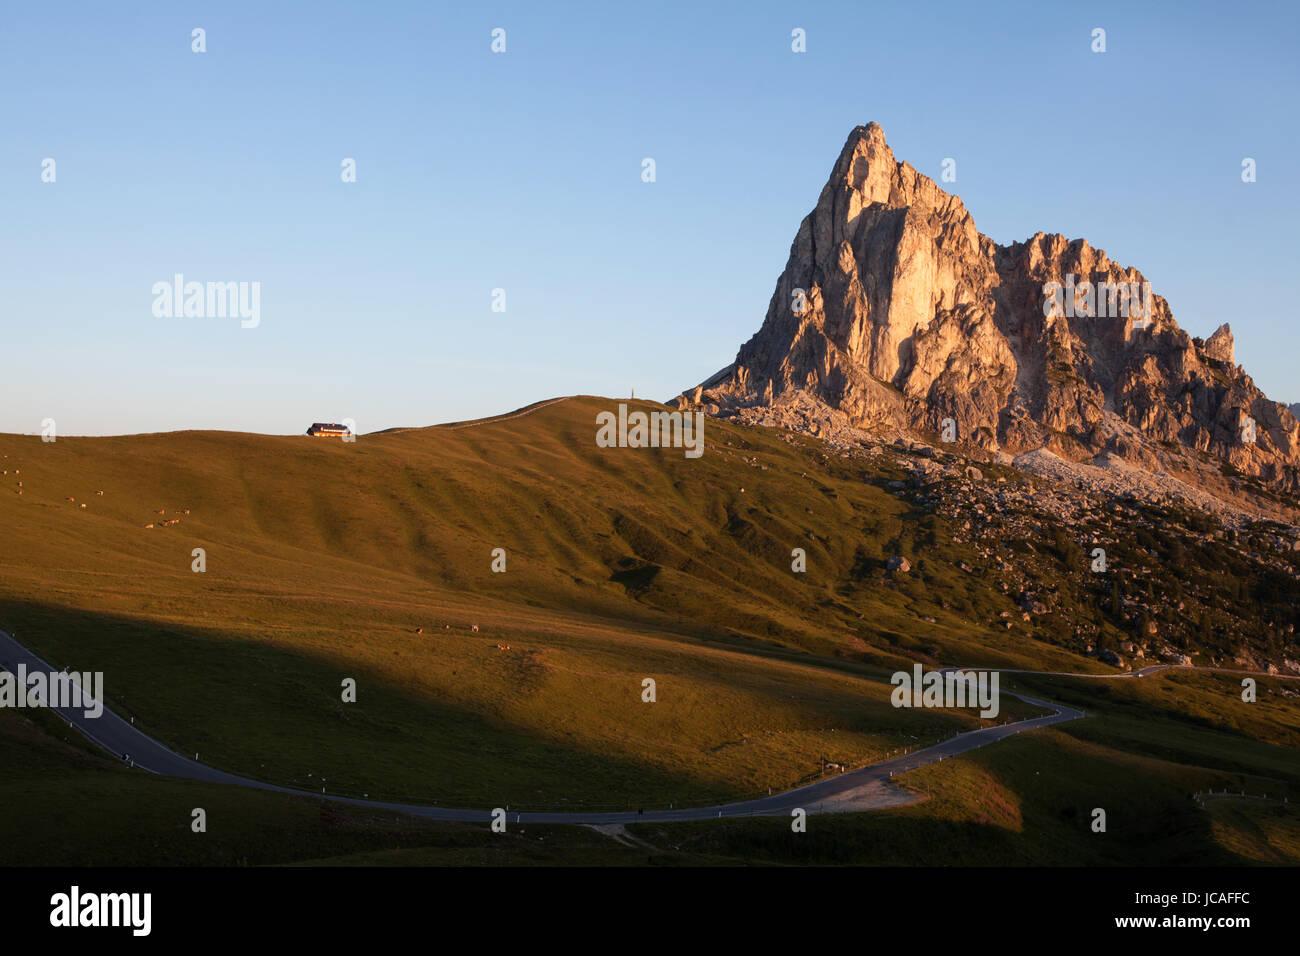 Passo Giau and Cima Ra Gusela, Dolomites, Italy. - Stock Image